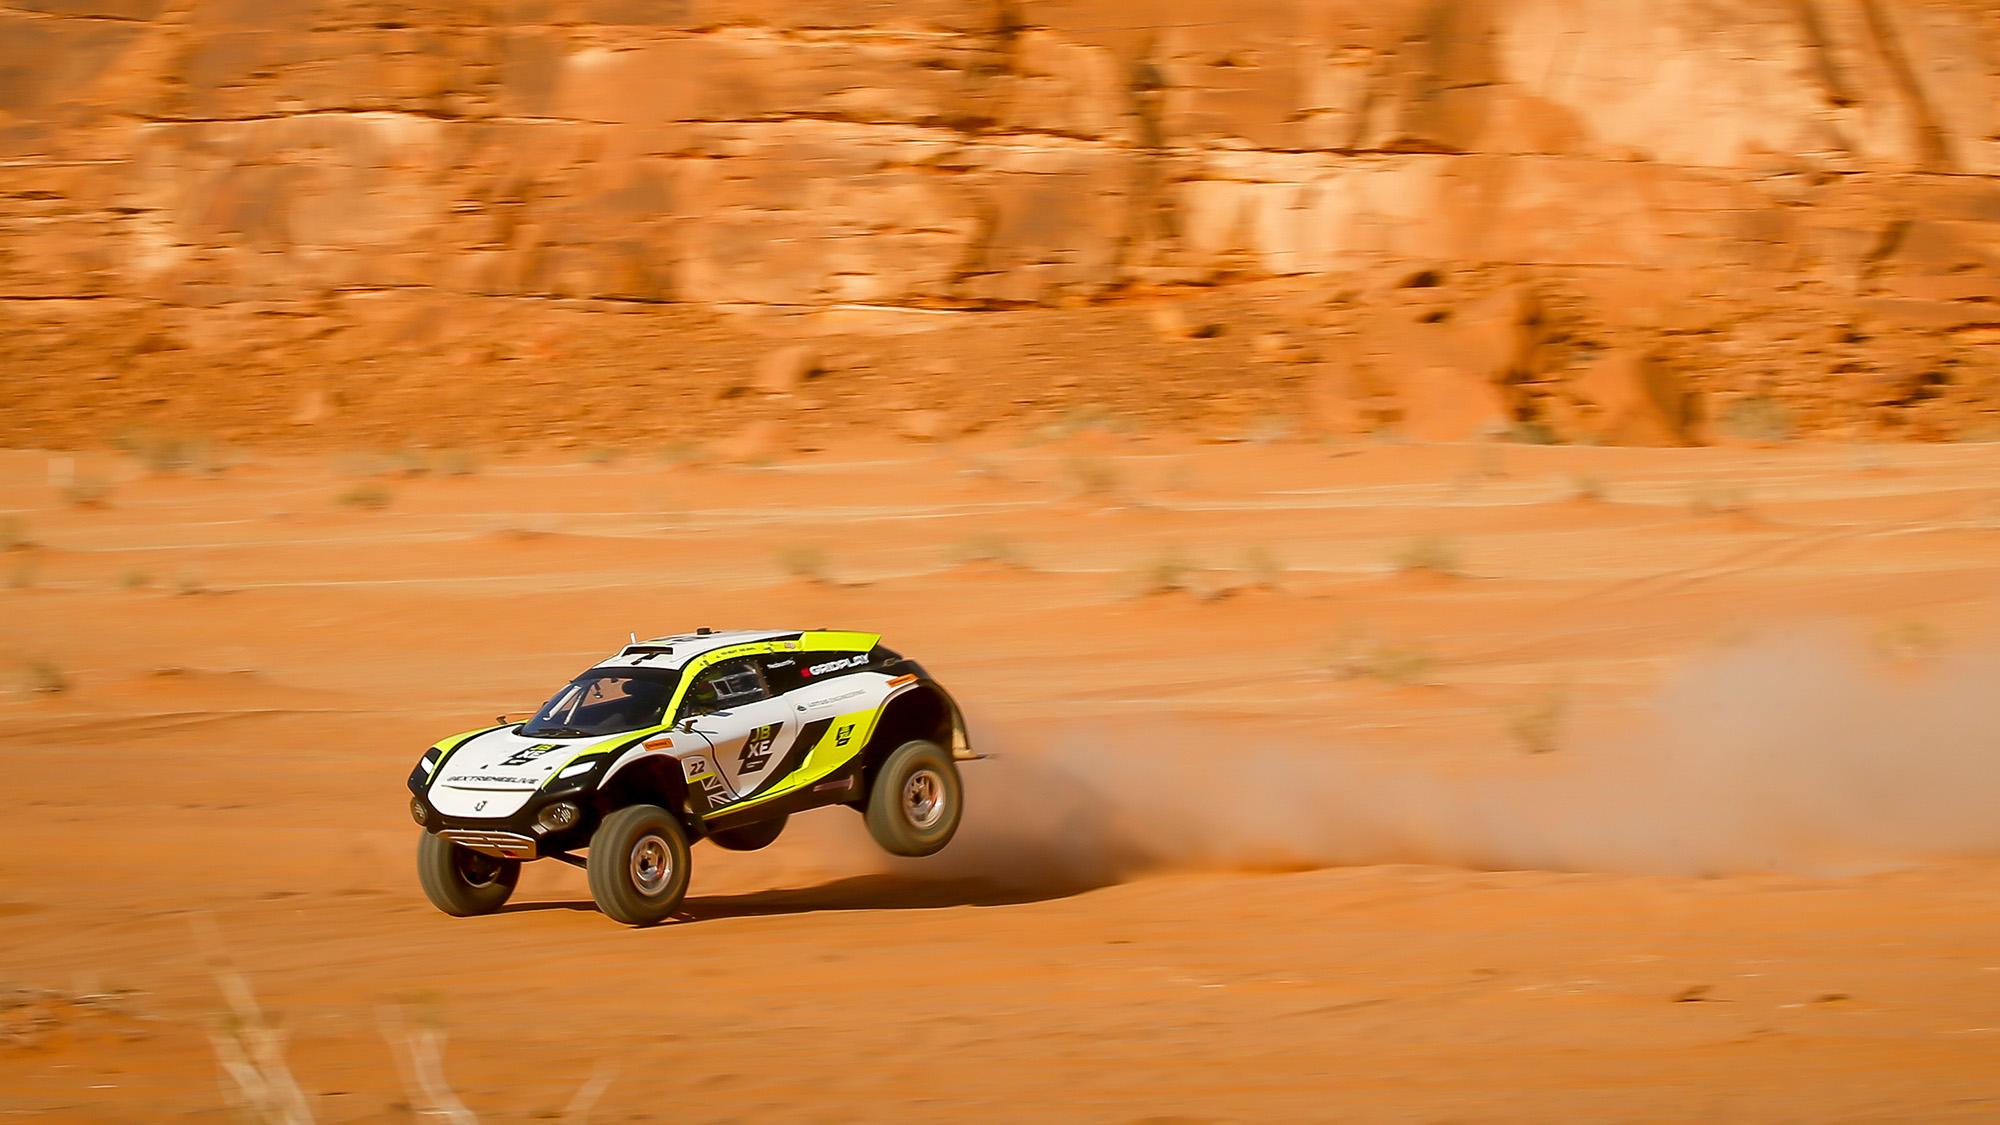 JBXE car during Saudi Arabia Extreme E event